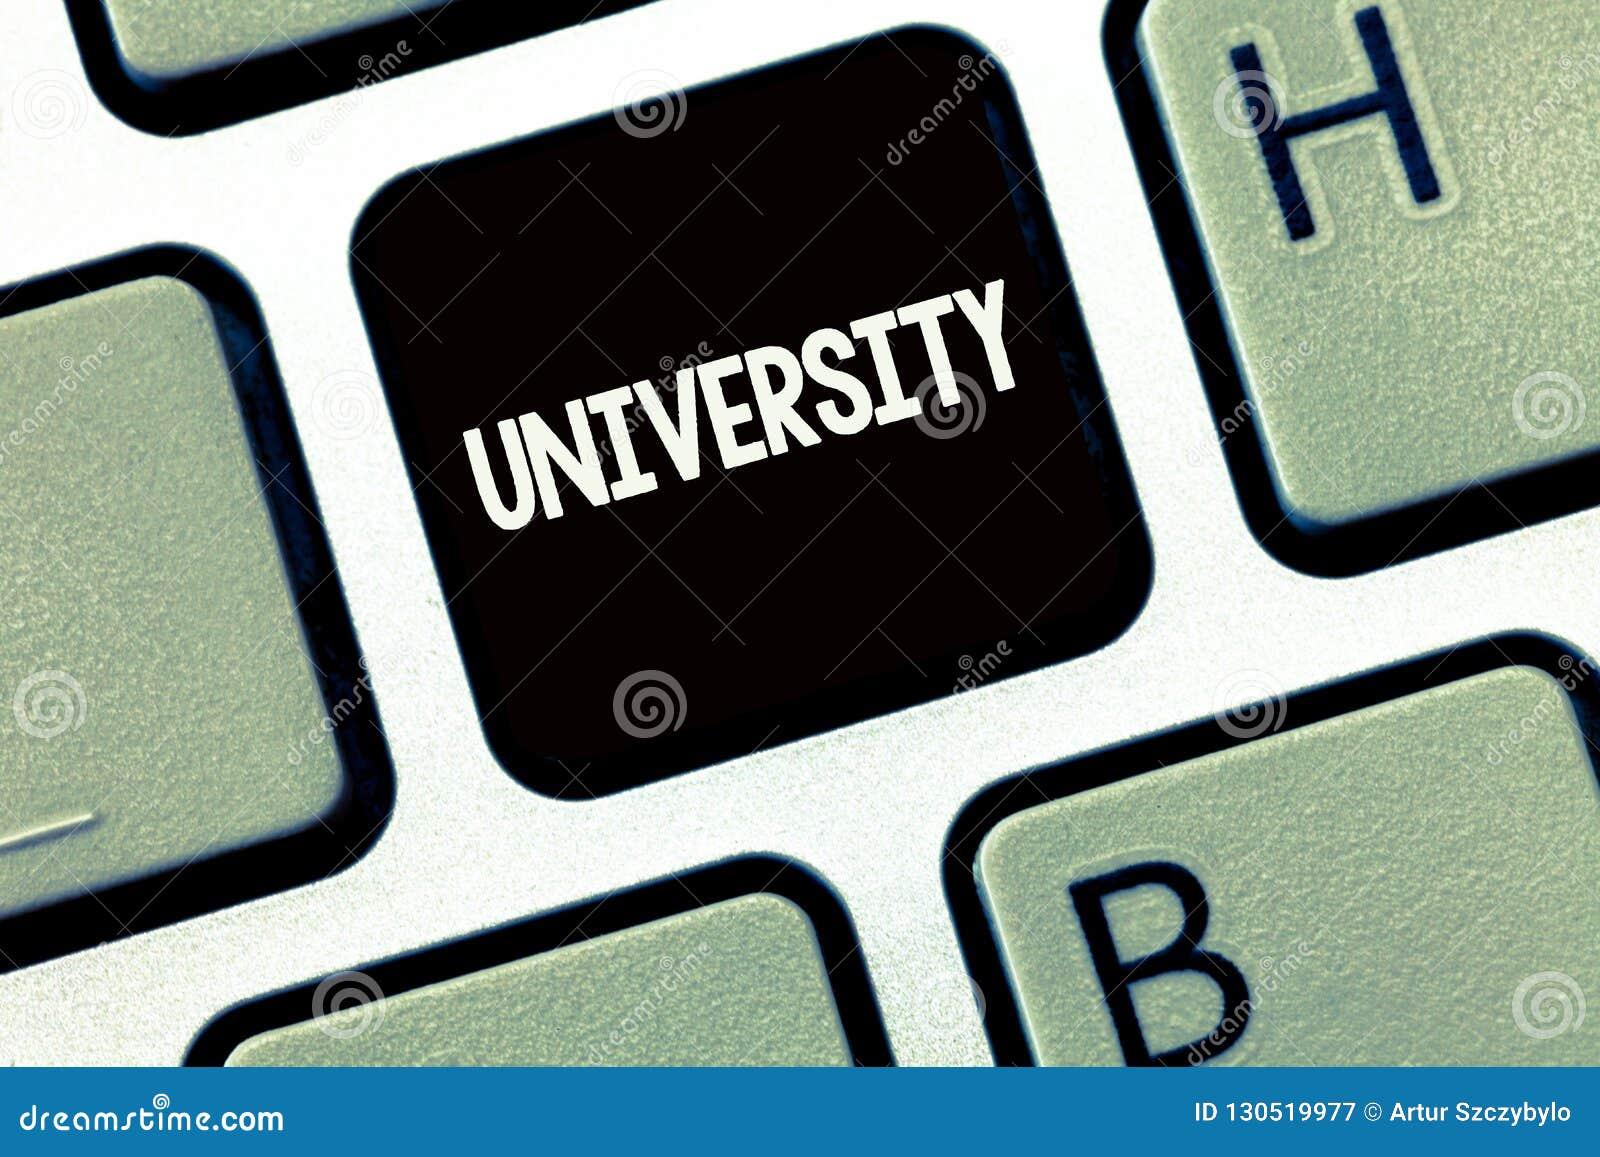 Universidad de la escritura del texto de la escritura El concepto que significa a estudiantes de alto nivel de la institución edu